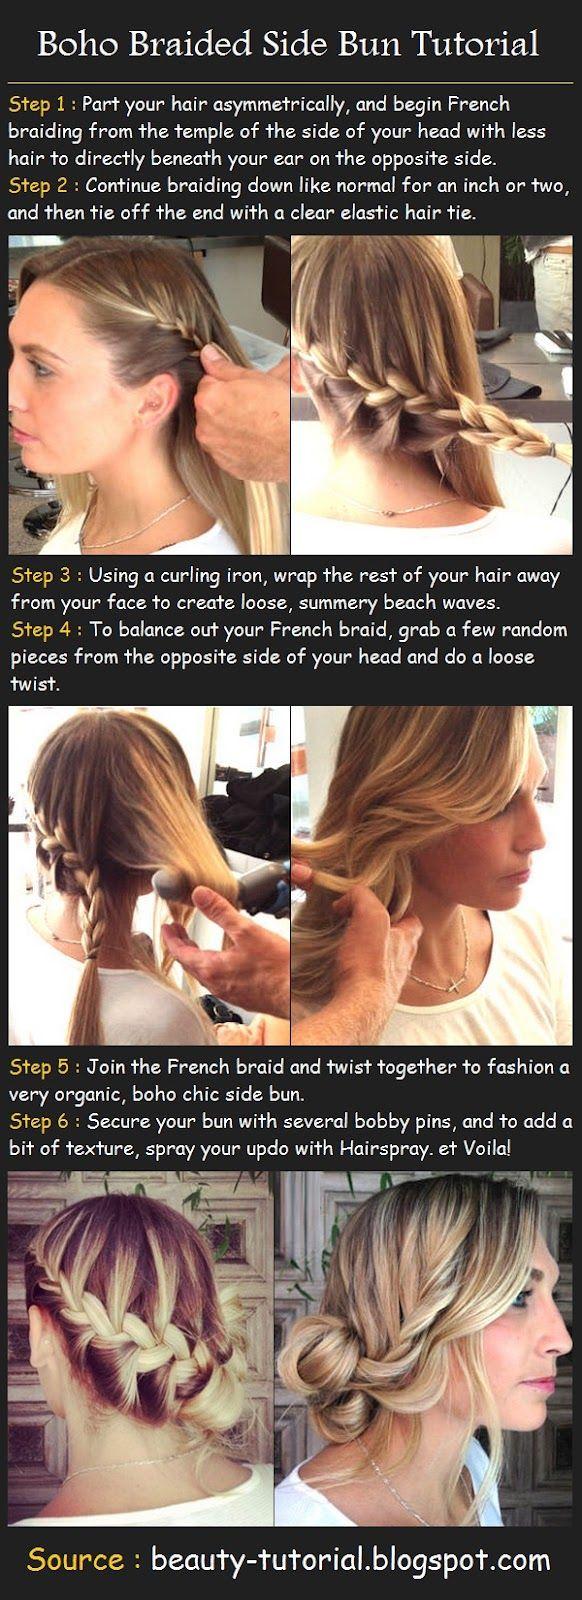 Boho Braided Side Bun Tutorial | Beauty Tutorials